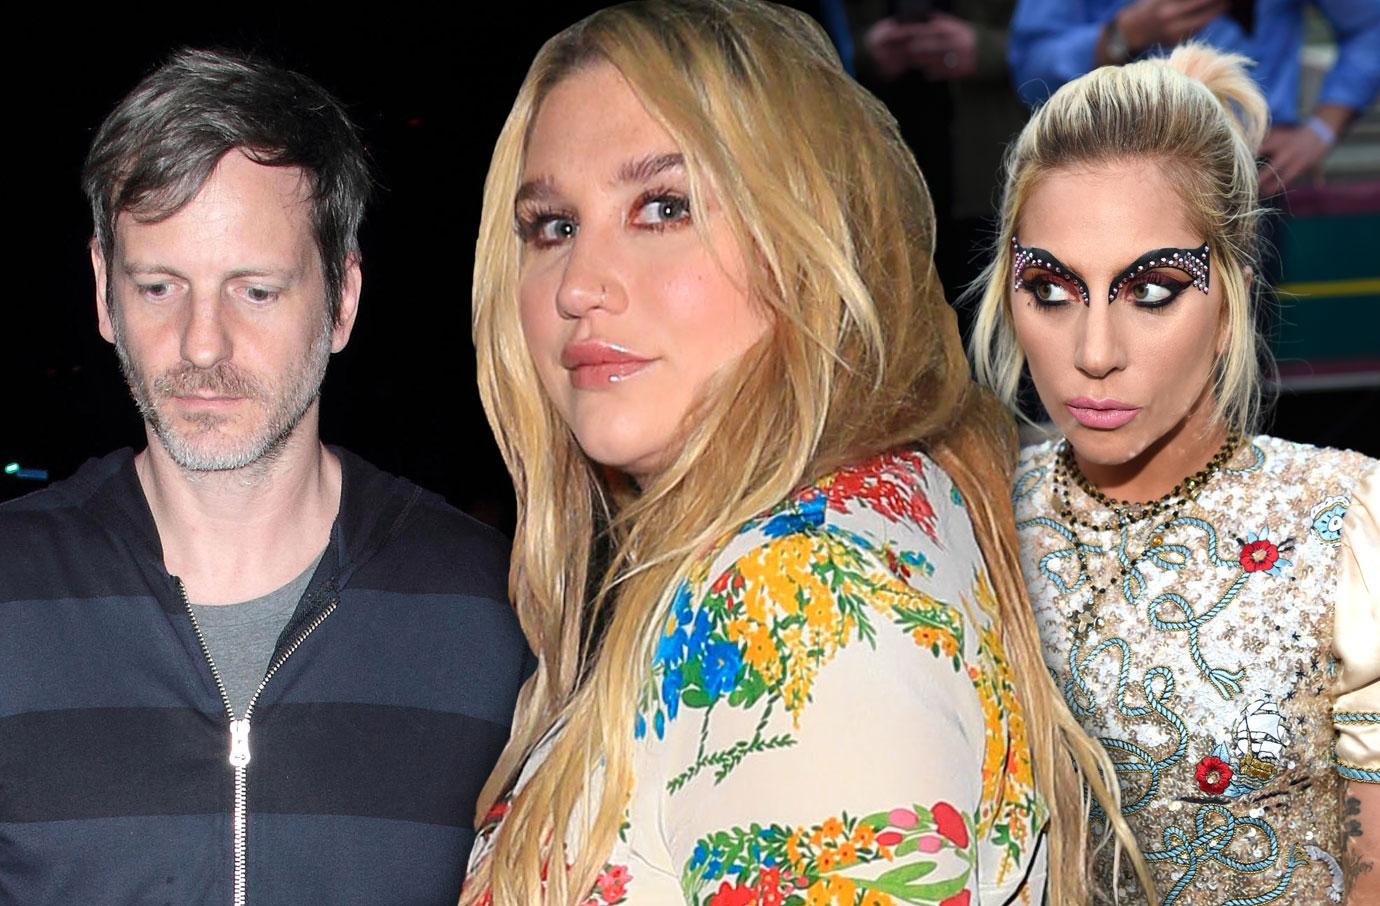 Kesha Dr Luke Rape Mark Geragos Lady Gaga Lawsuit